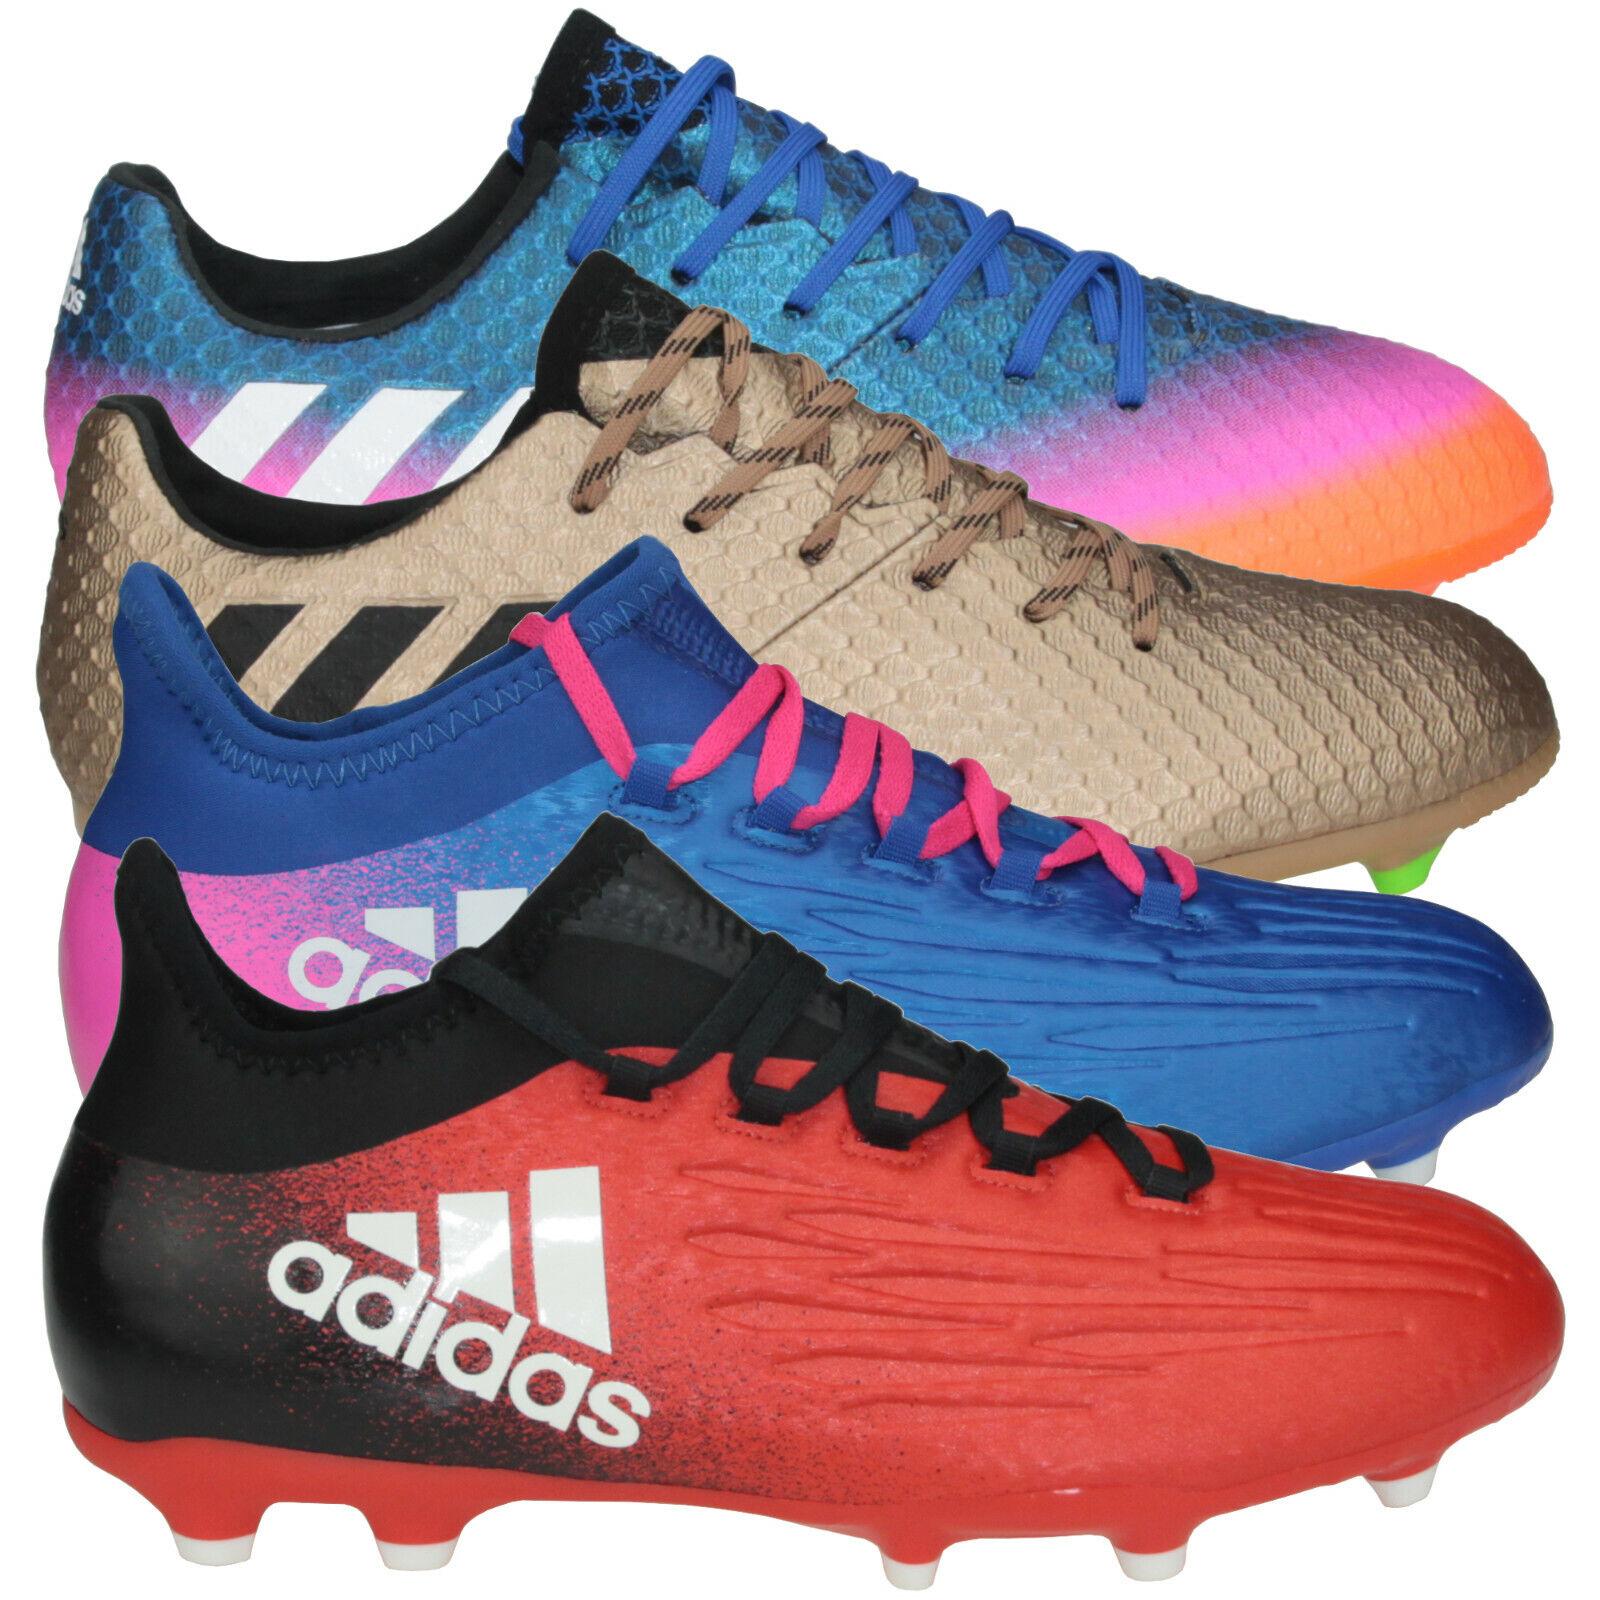 Rote Adidas Fussballschuhe Test Vergleich Rote Adidas